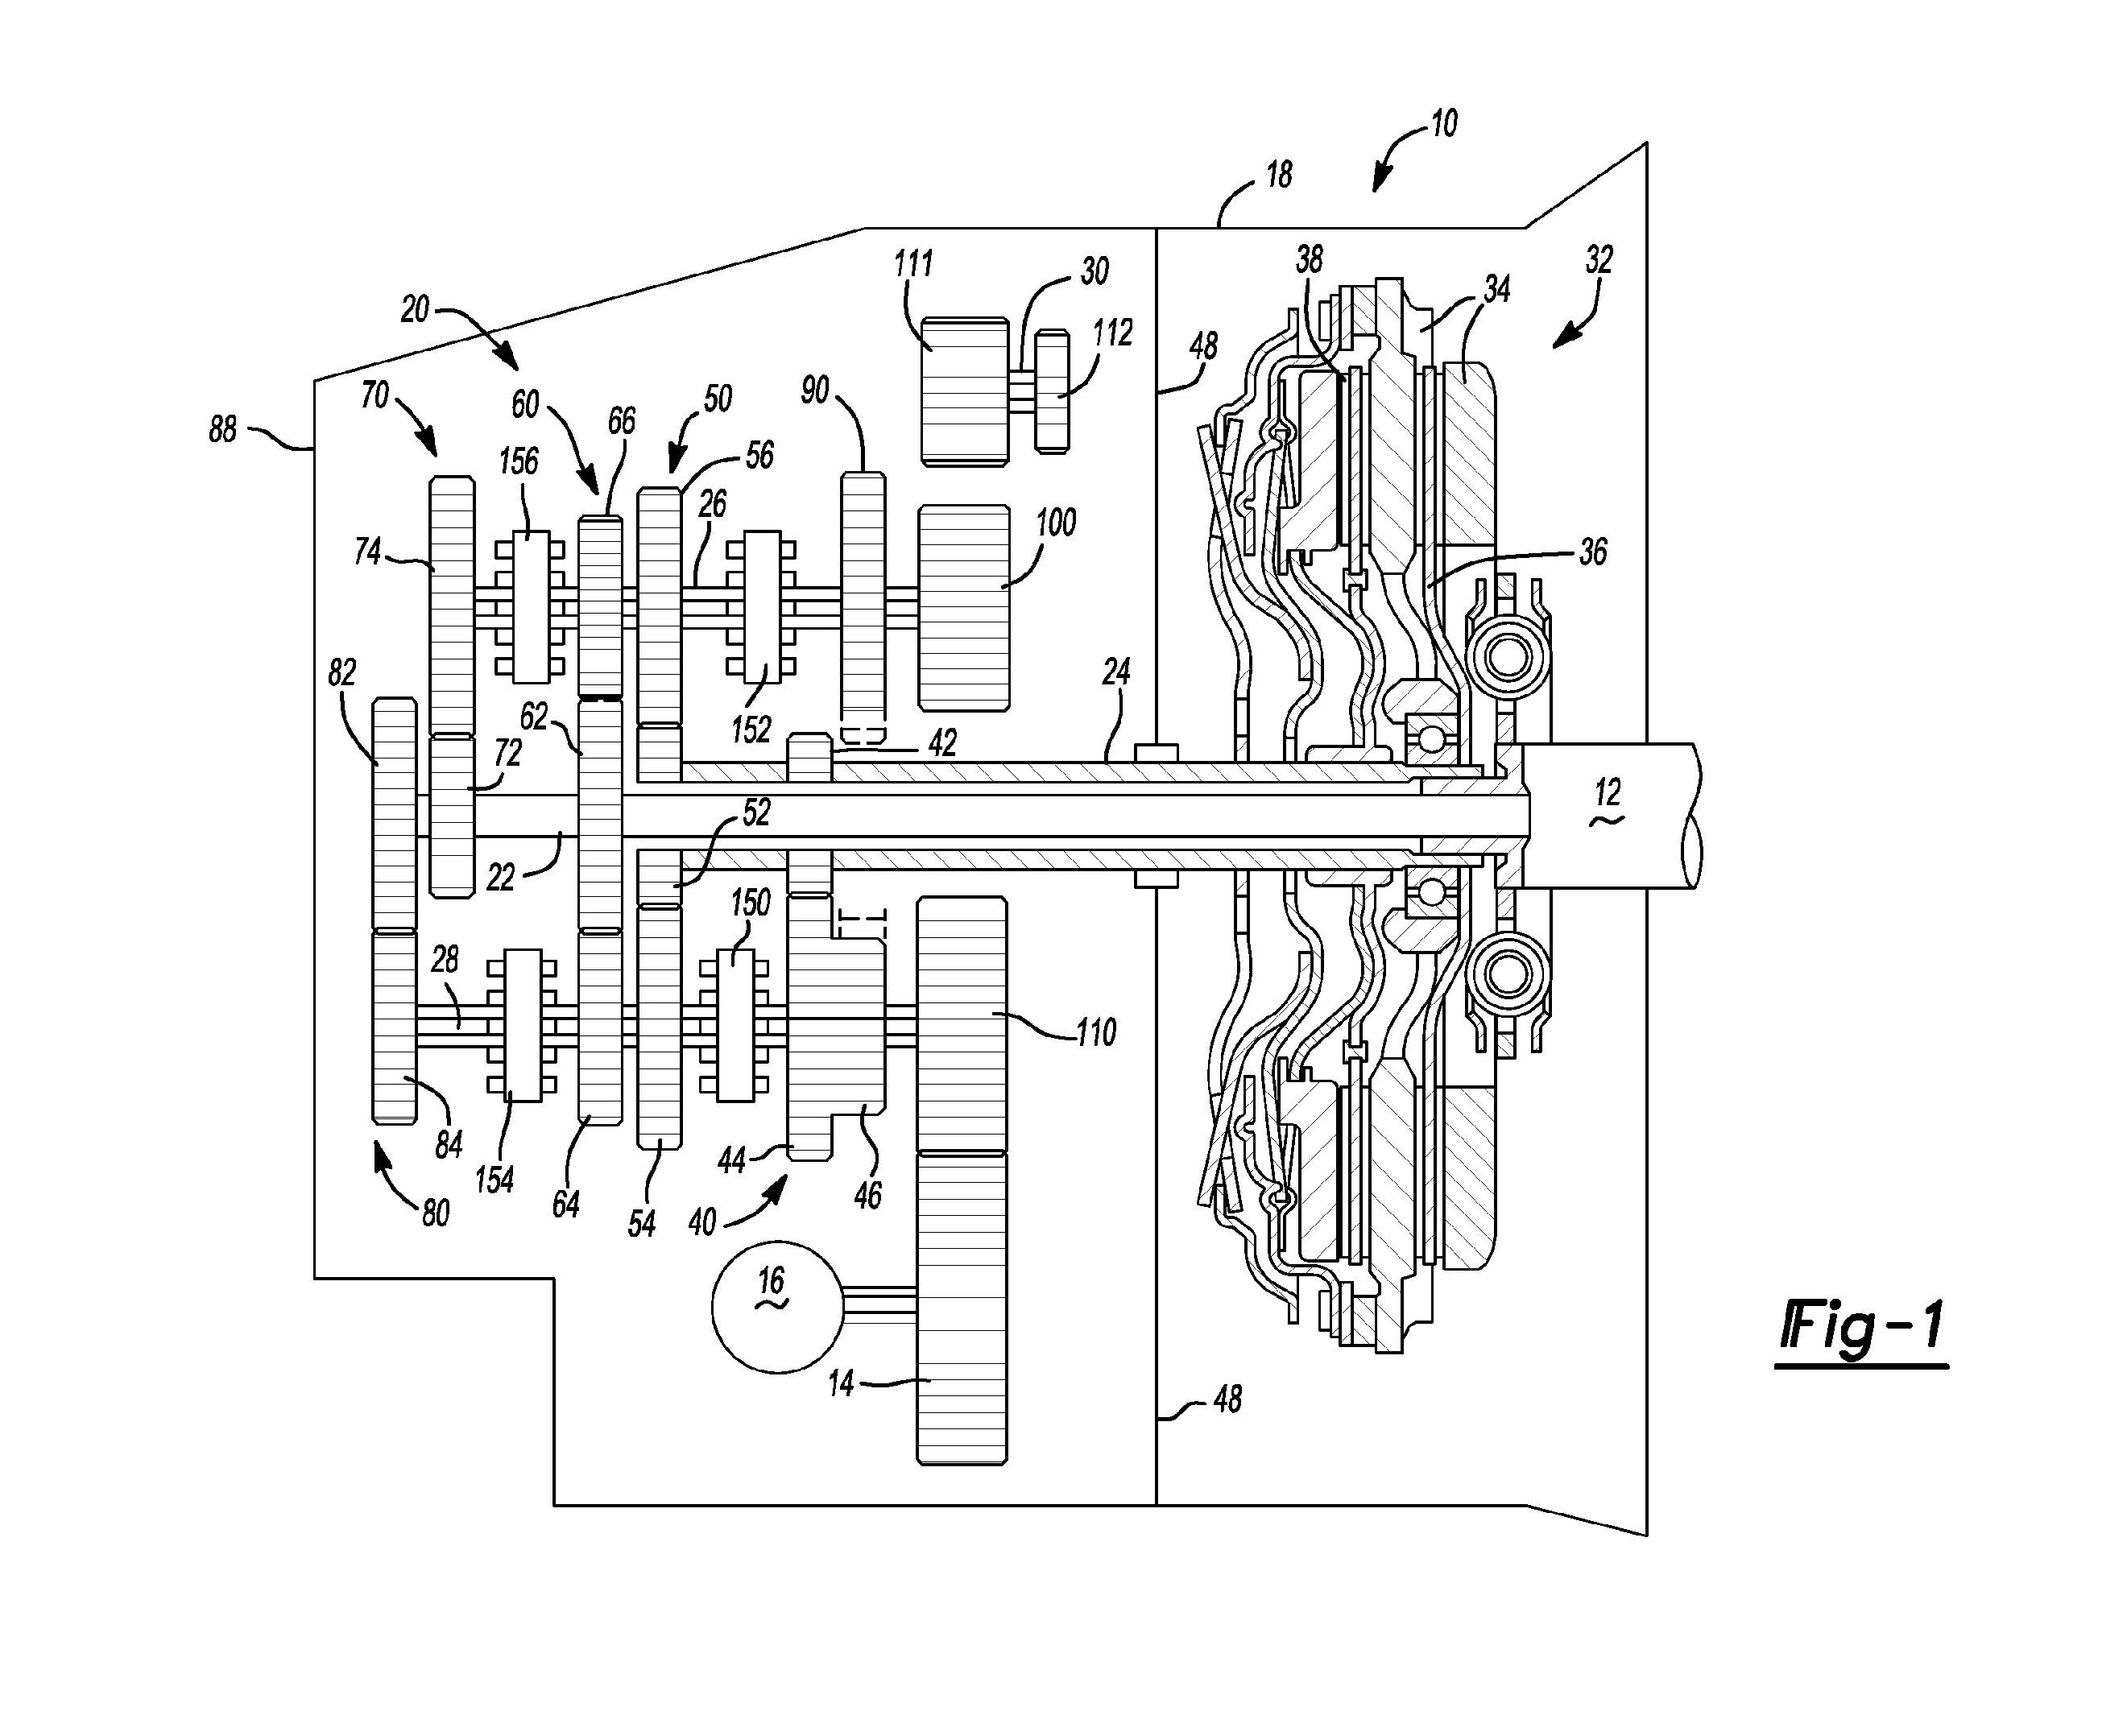 gm dual clutch transmission gm high tech performance suzuki clutch diagram gm clutch diagram [ 2641 x 2156 Pixel ]